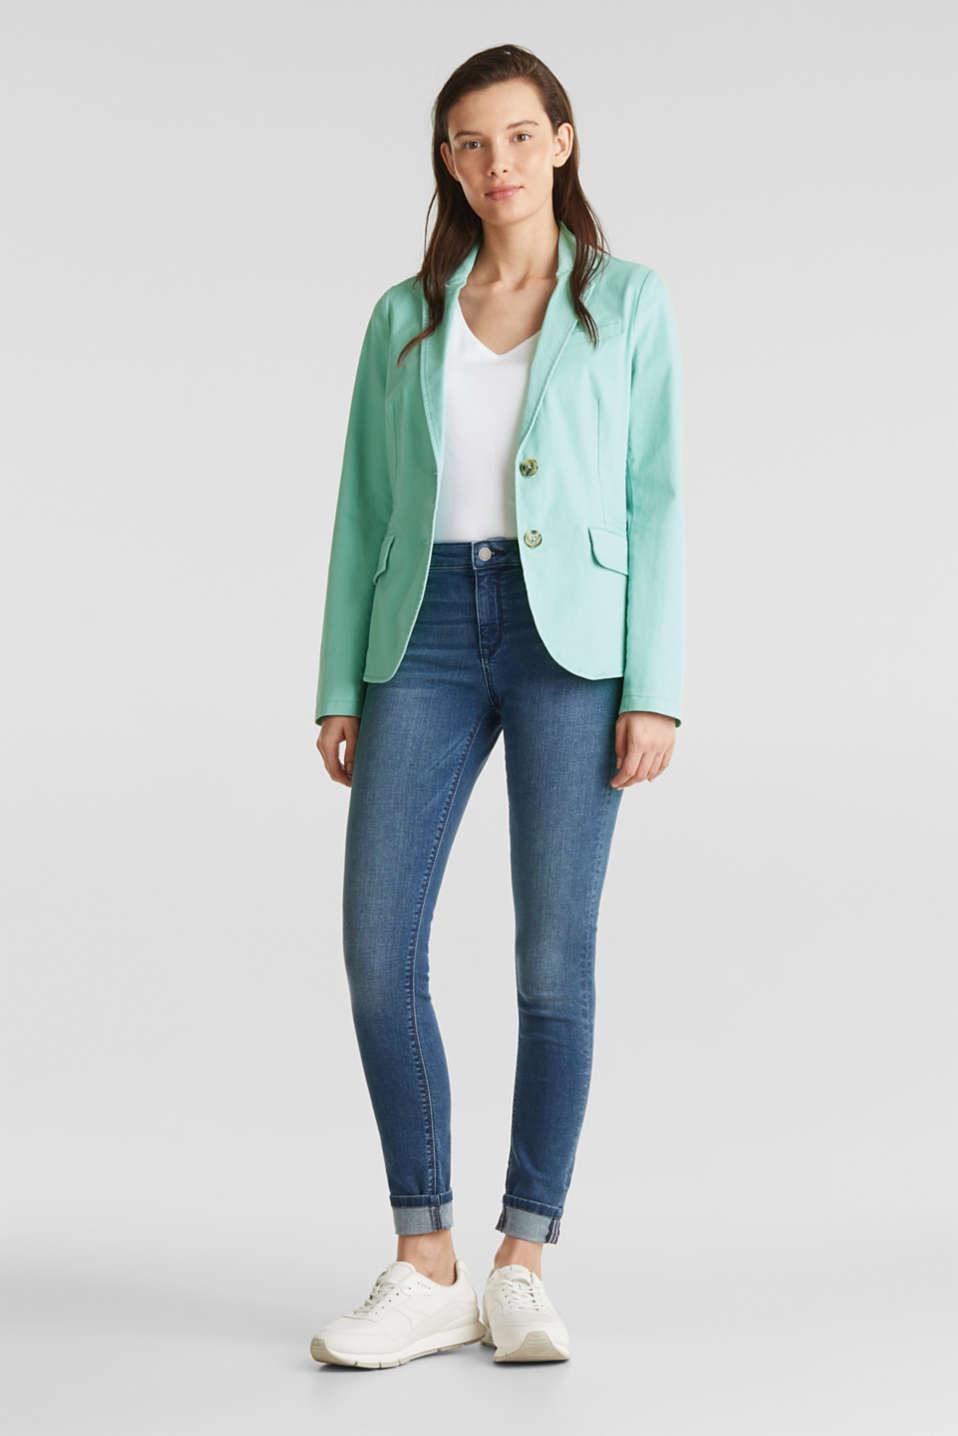 Stretch cotton blazer with a peach finish, LIGHT AQUA GREEN, detail image number 1